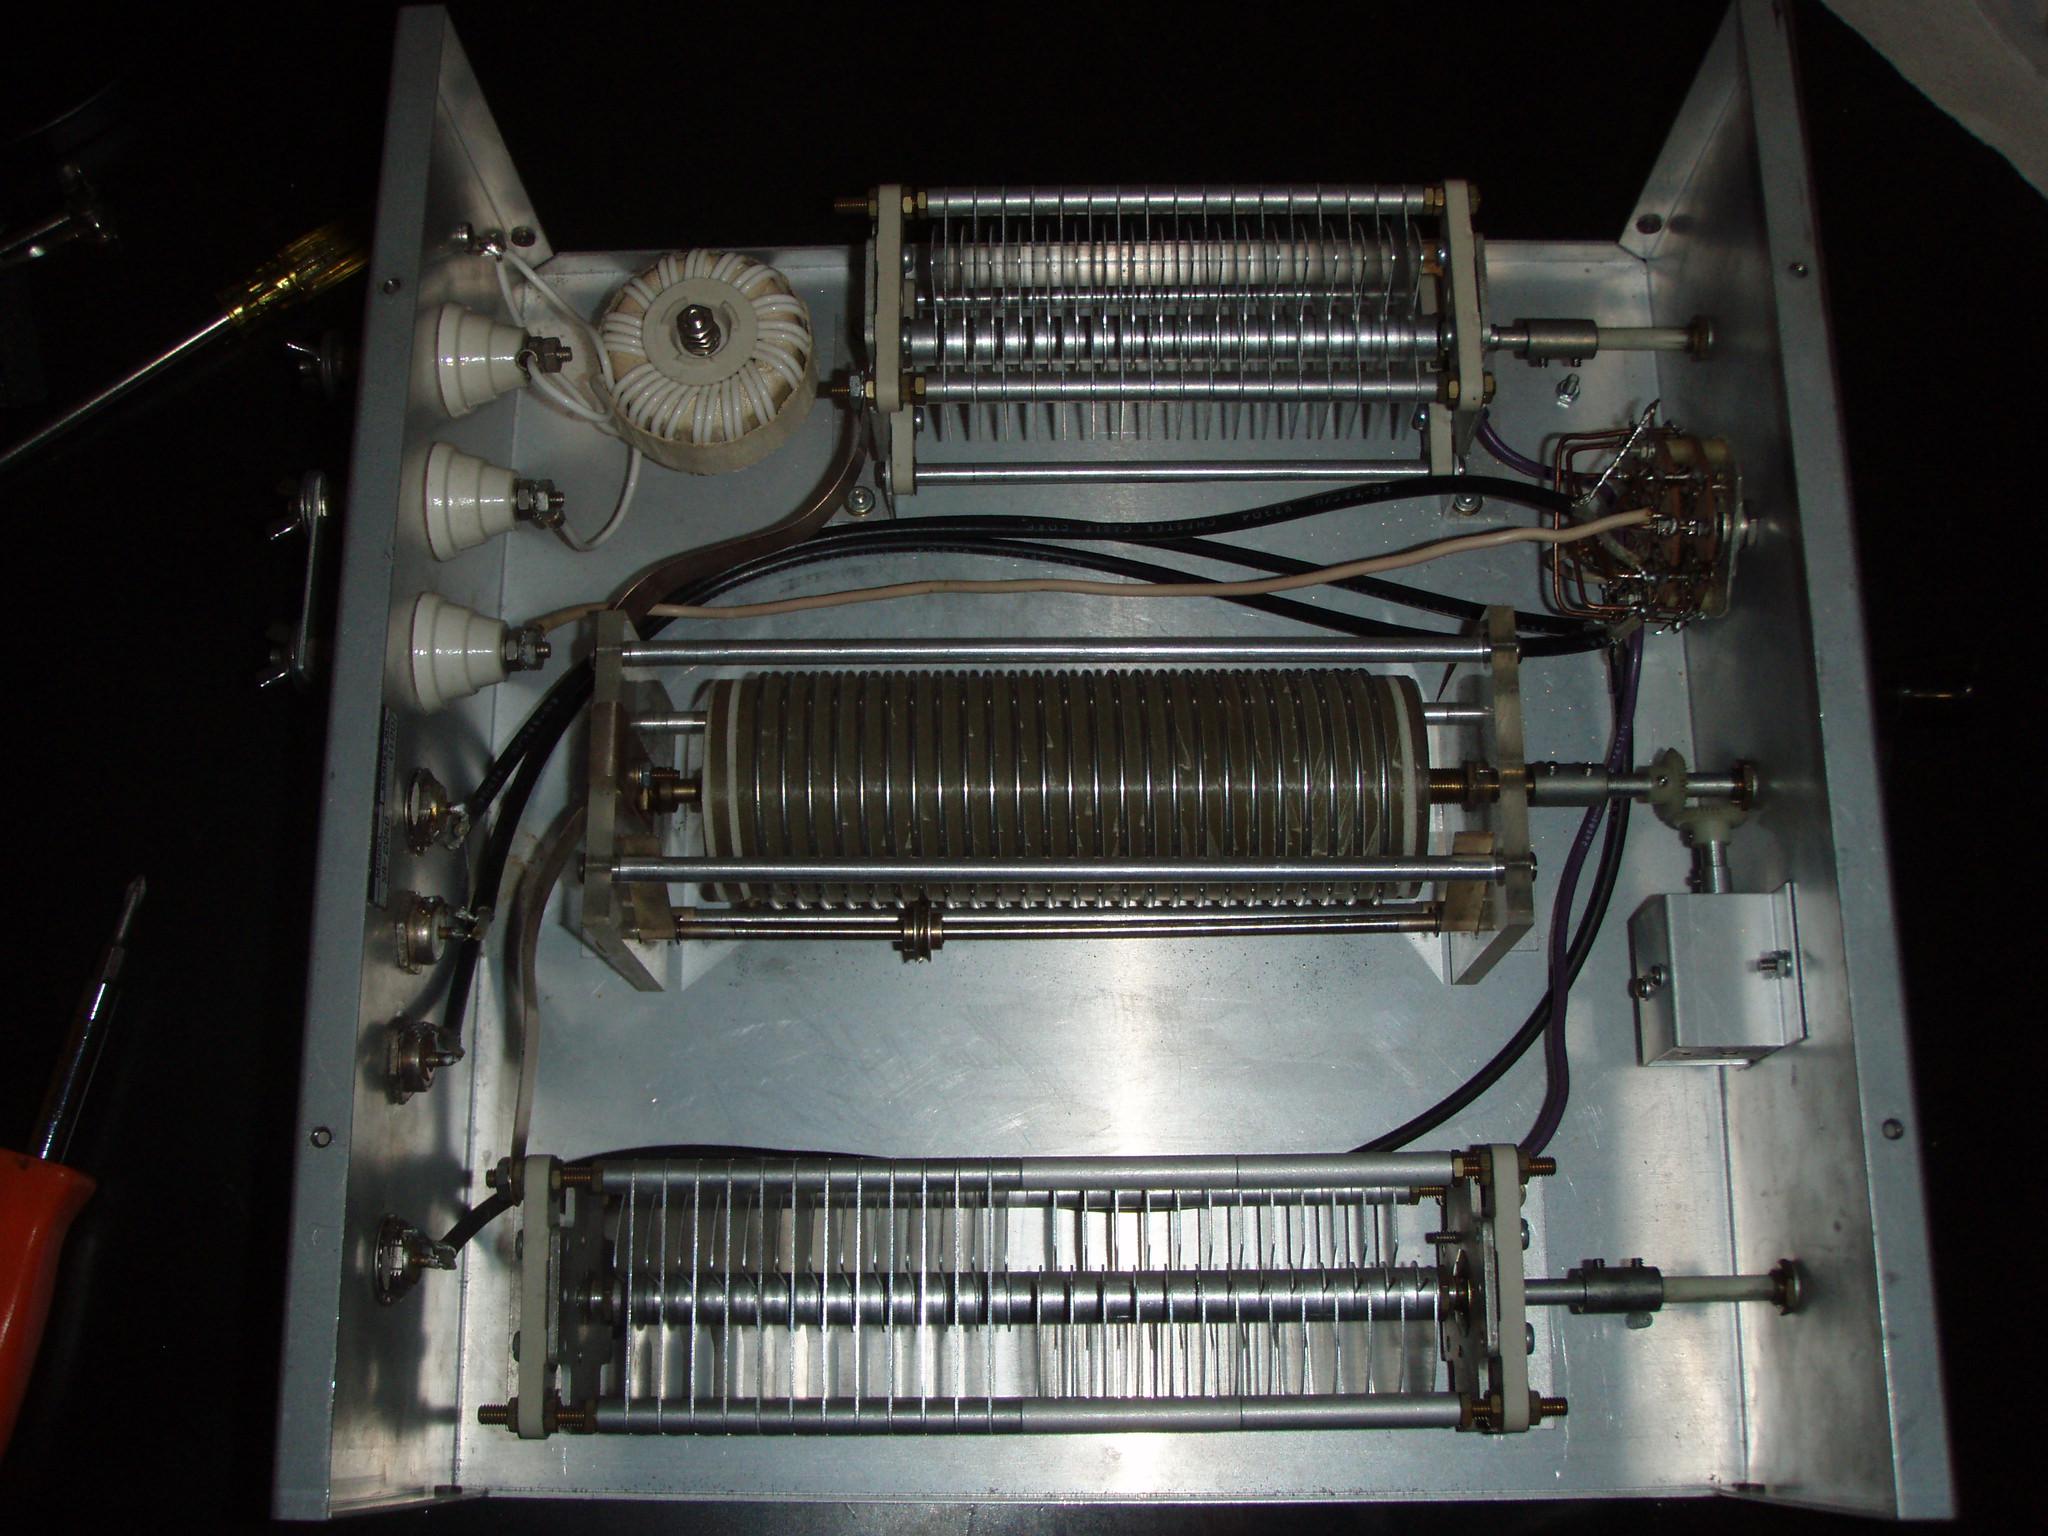 Antenna tuner sa-2040 amateur-d heathkit brand, heath co. ; b.